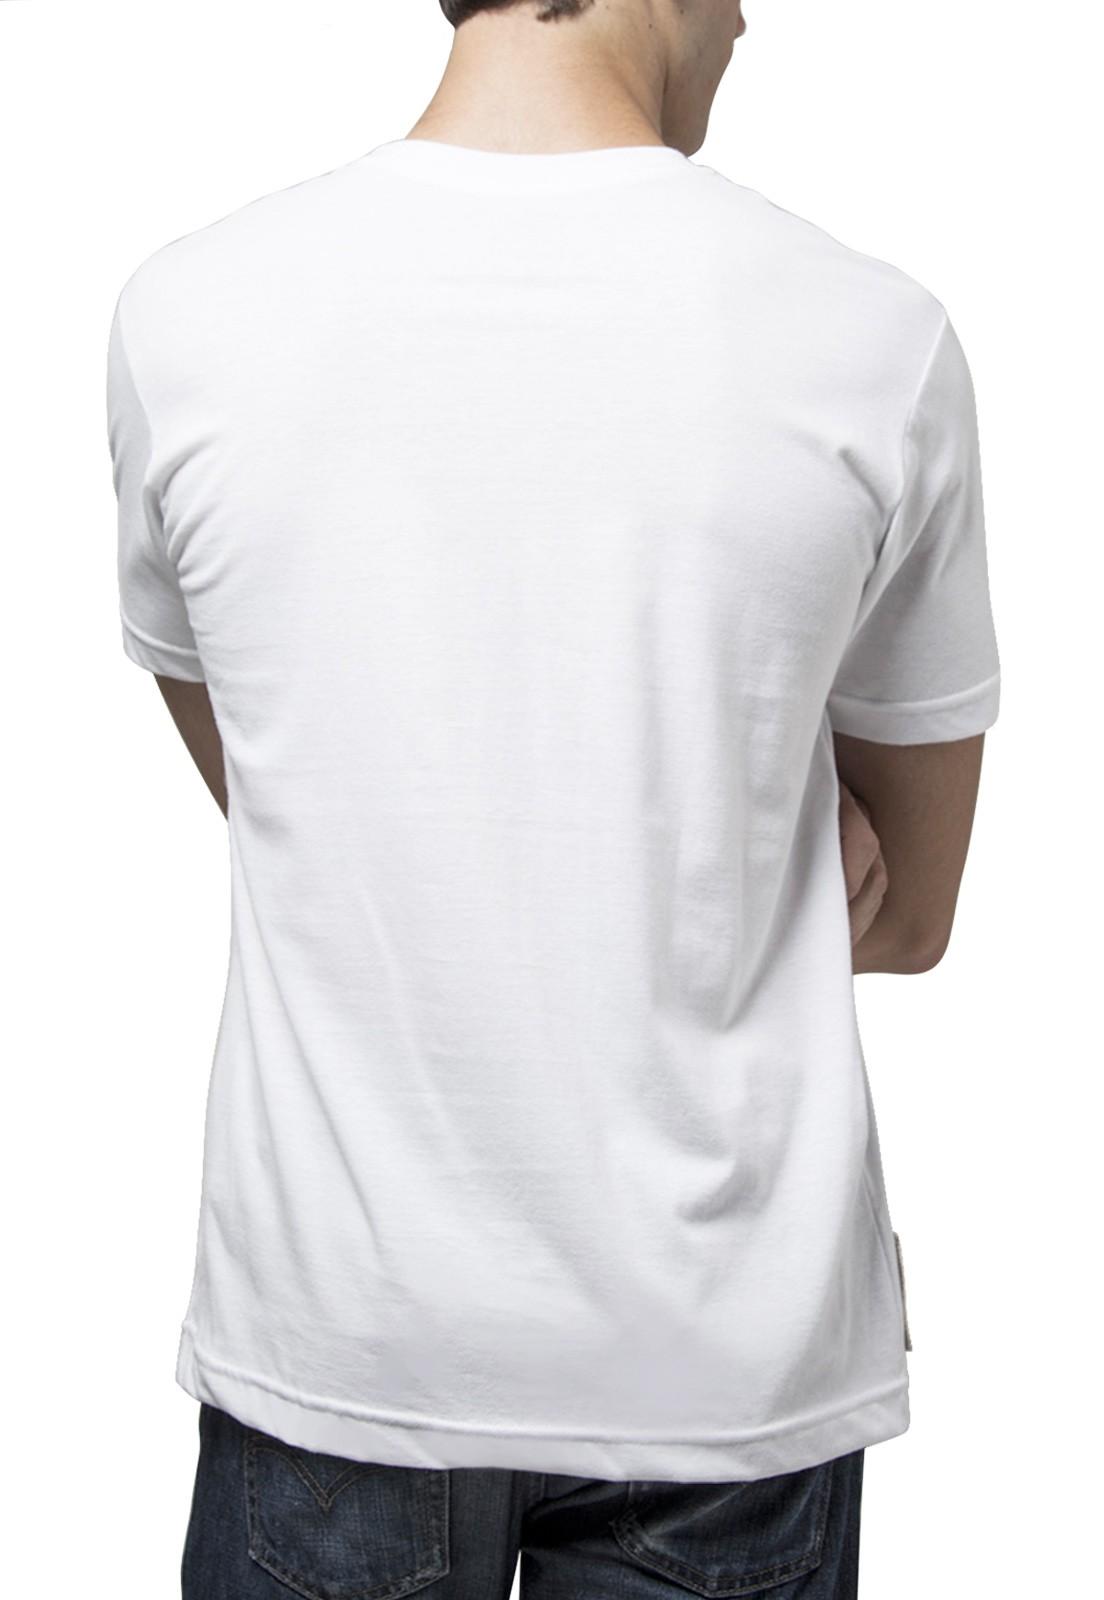 Camiseta Amazônia Bicos de Tucano - Branco